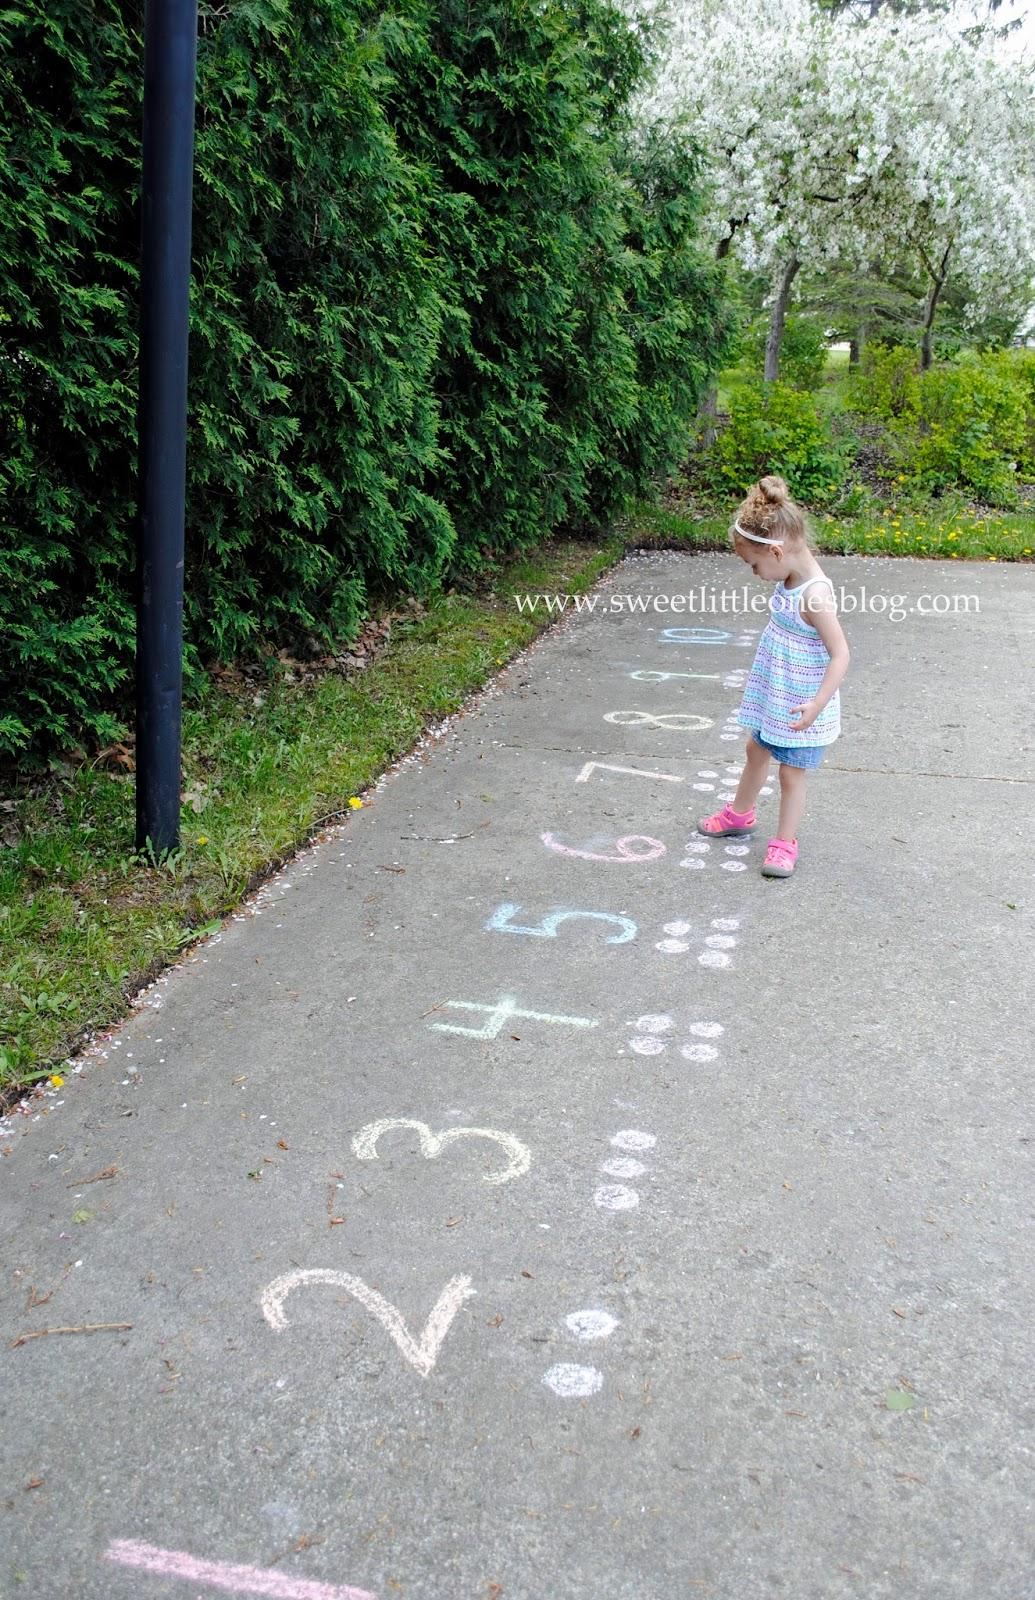 sweet little ones sidewalk chalk fun 45 games and activities